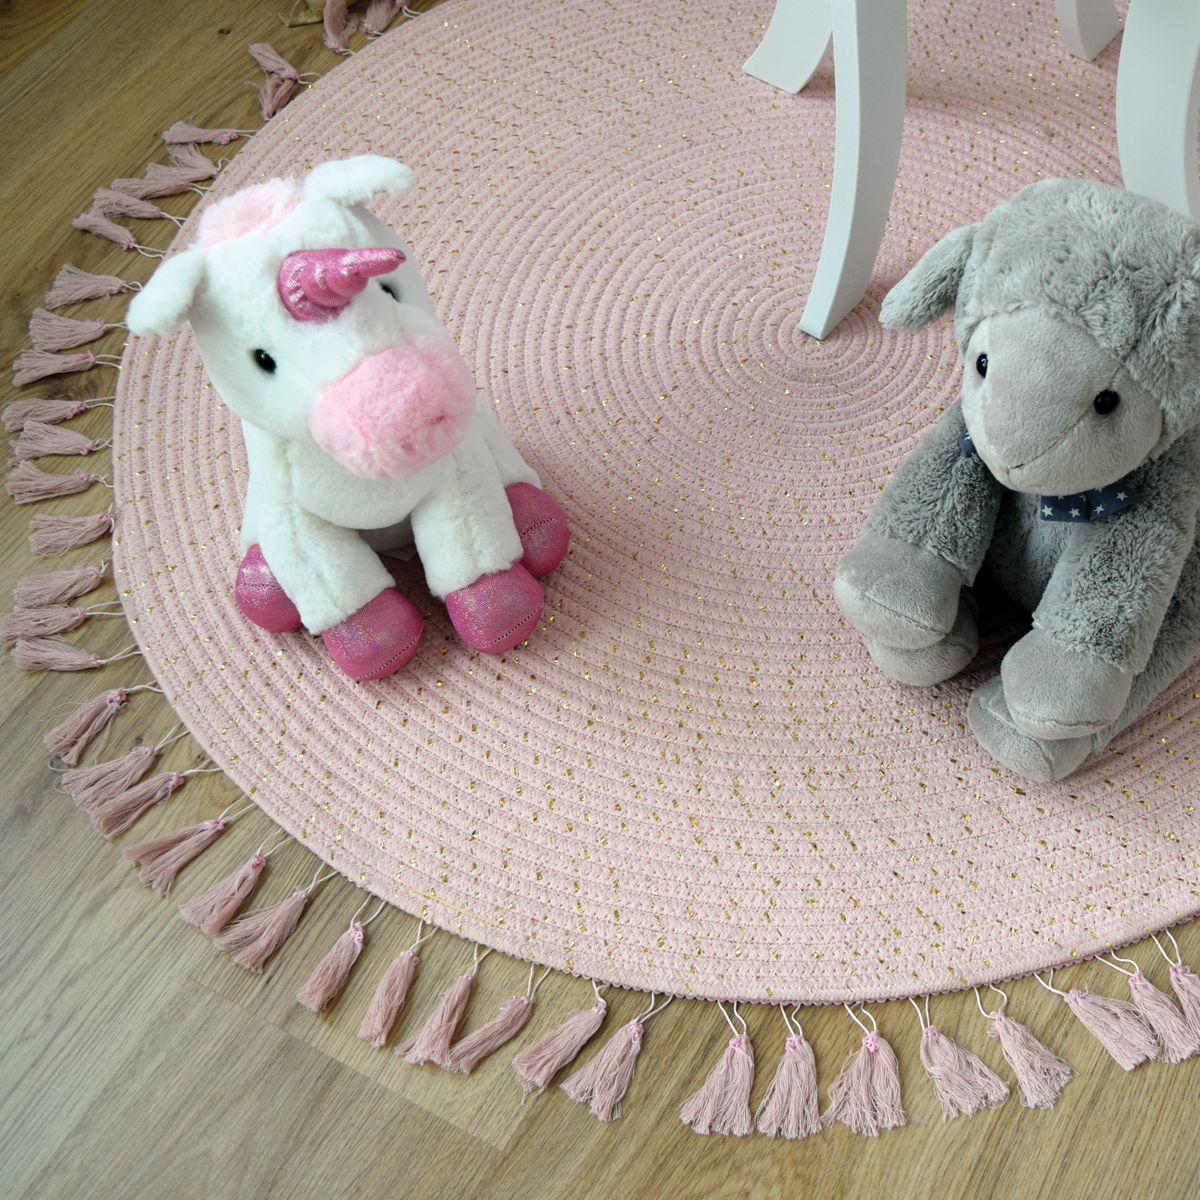 Tapis enfant rond à franges rose lurex D. 90 cm